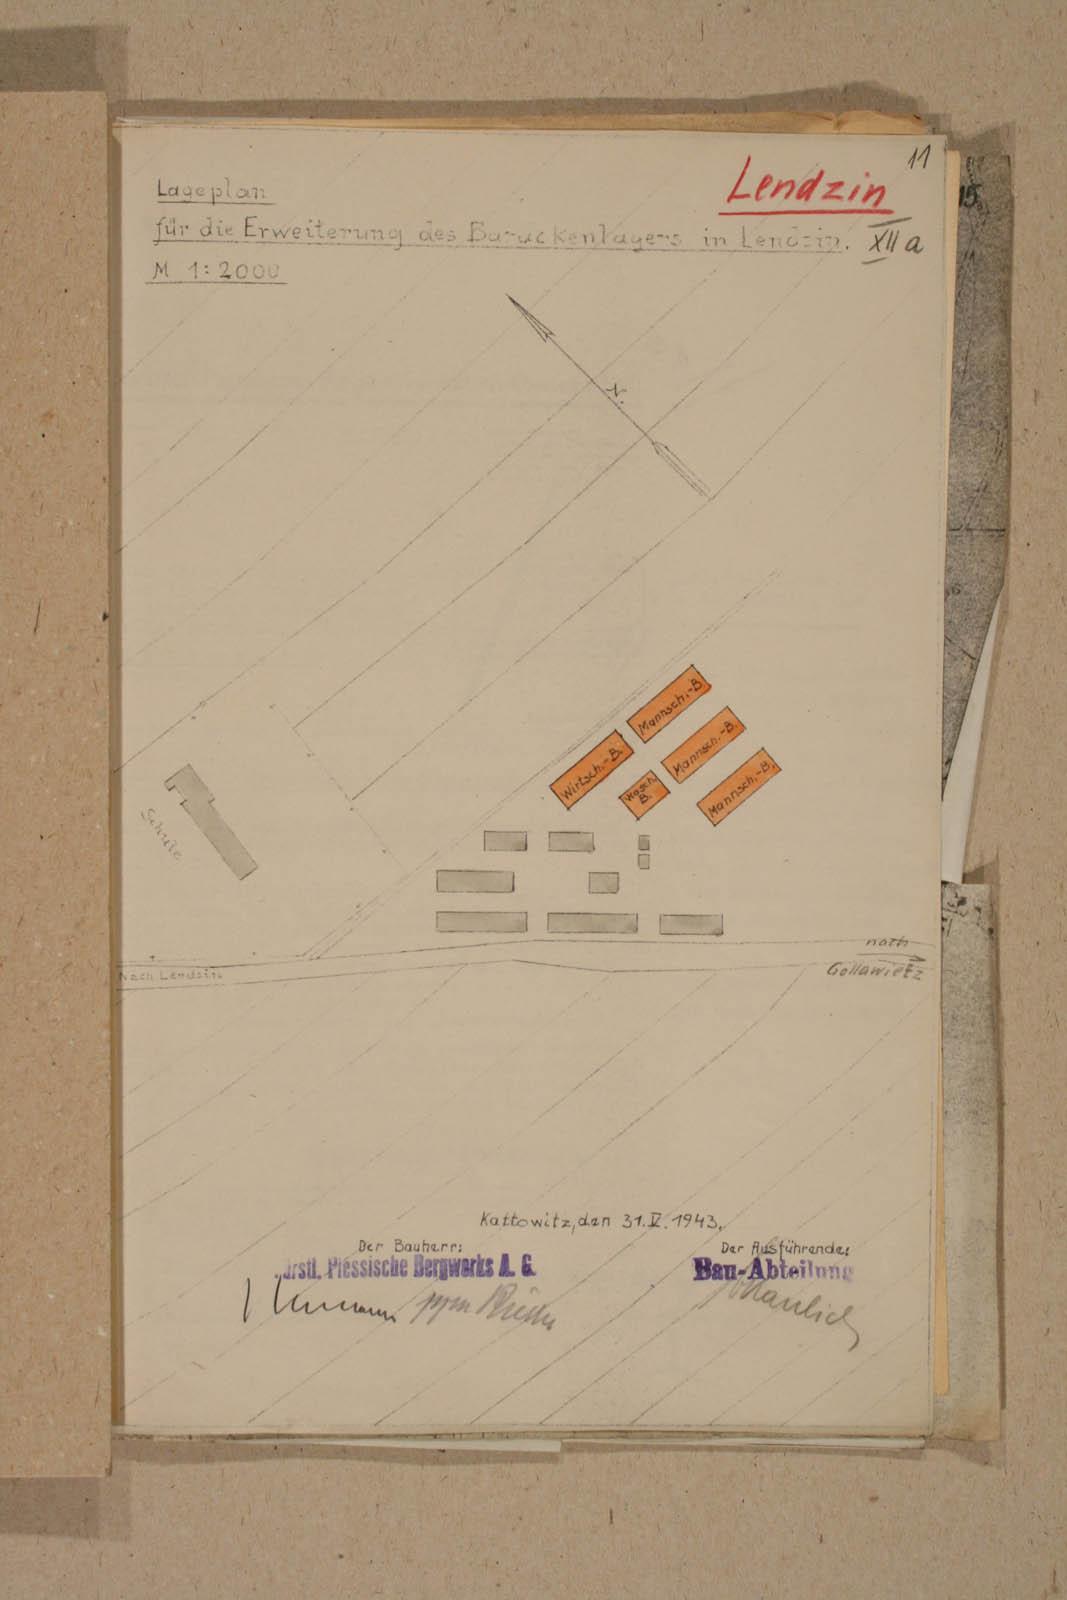 Archiwum Panstwowe w Katowicach Land Pl 12 120 708 11